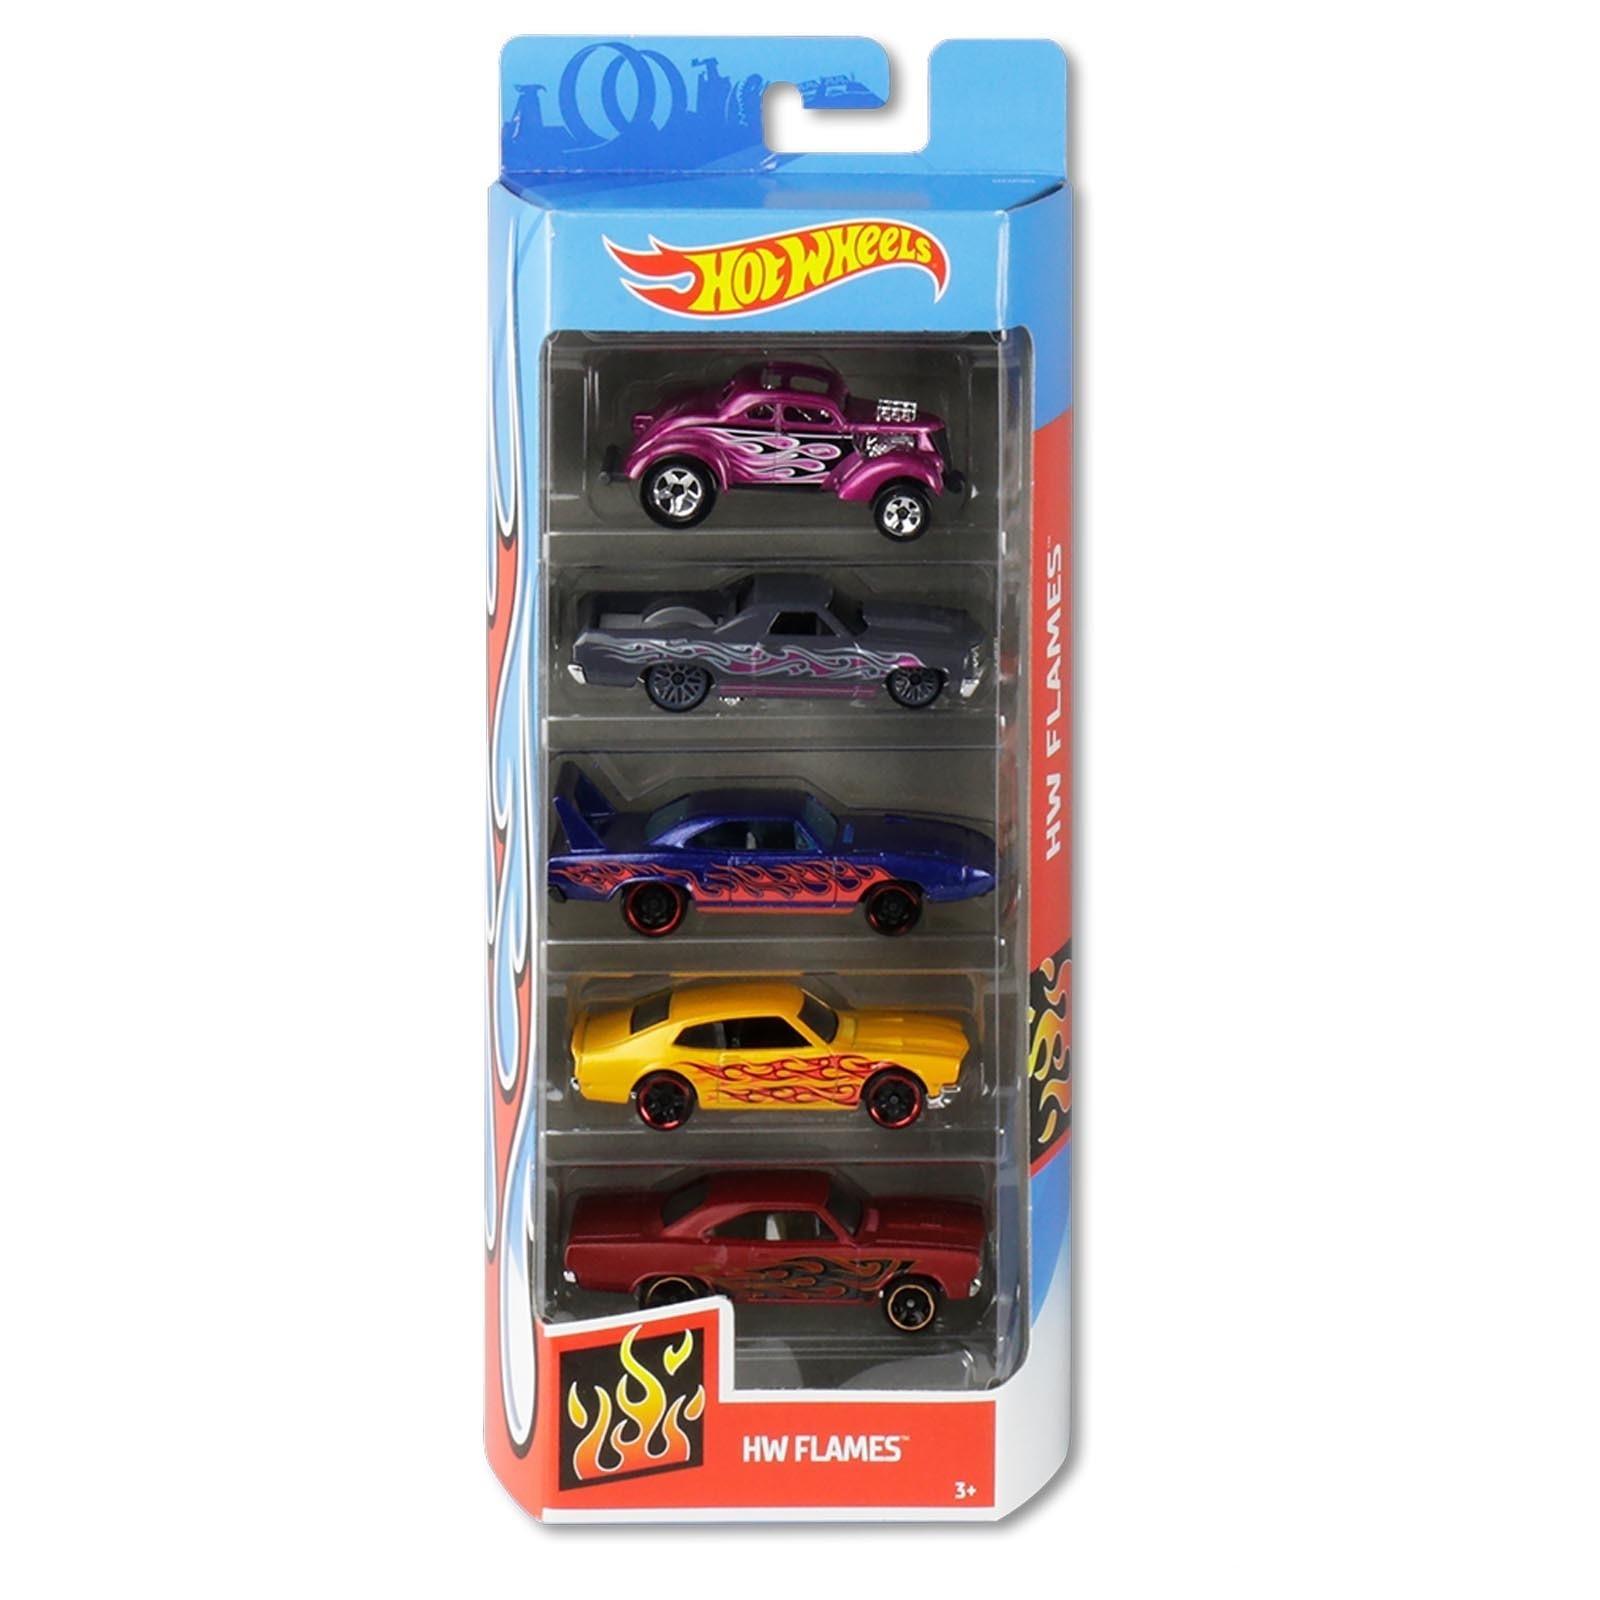 Pack Com 5 Carrinho Hot Wheels: Hw Flames - Mattel